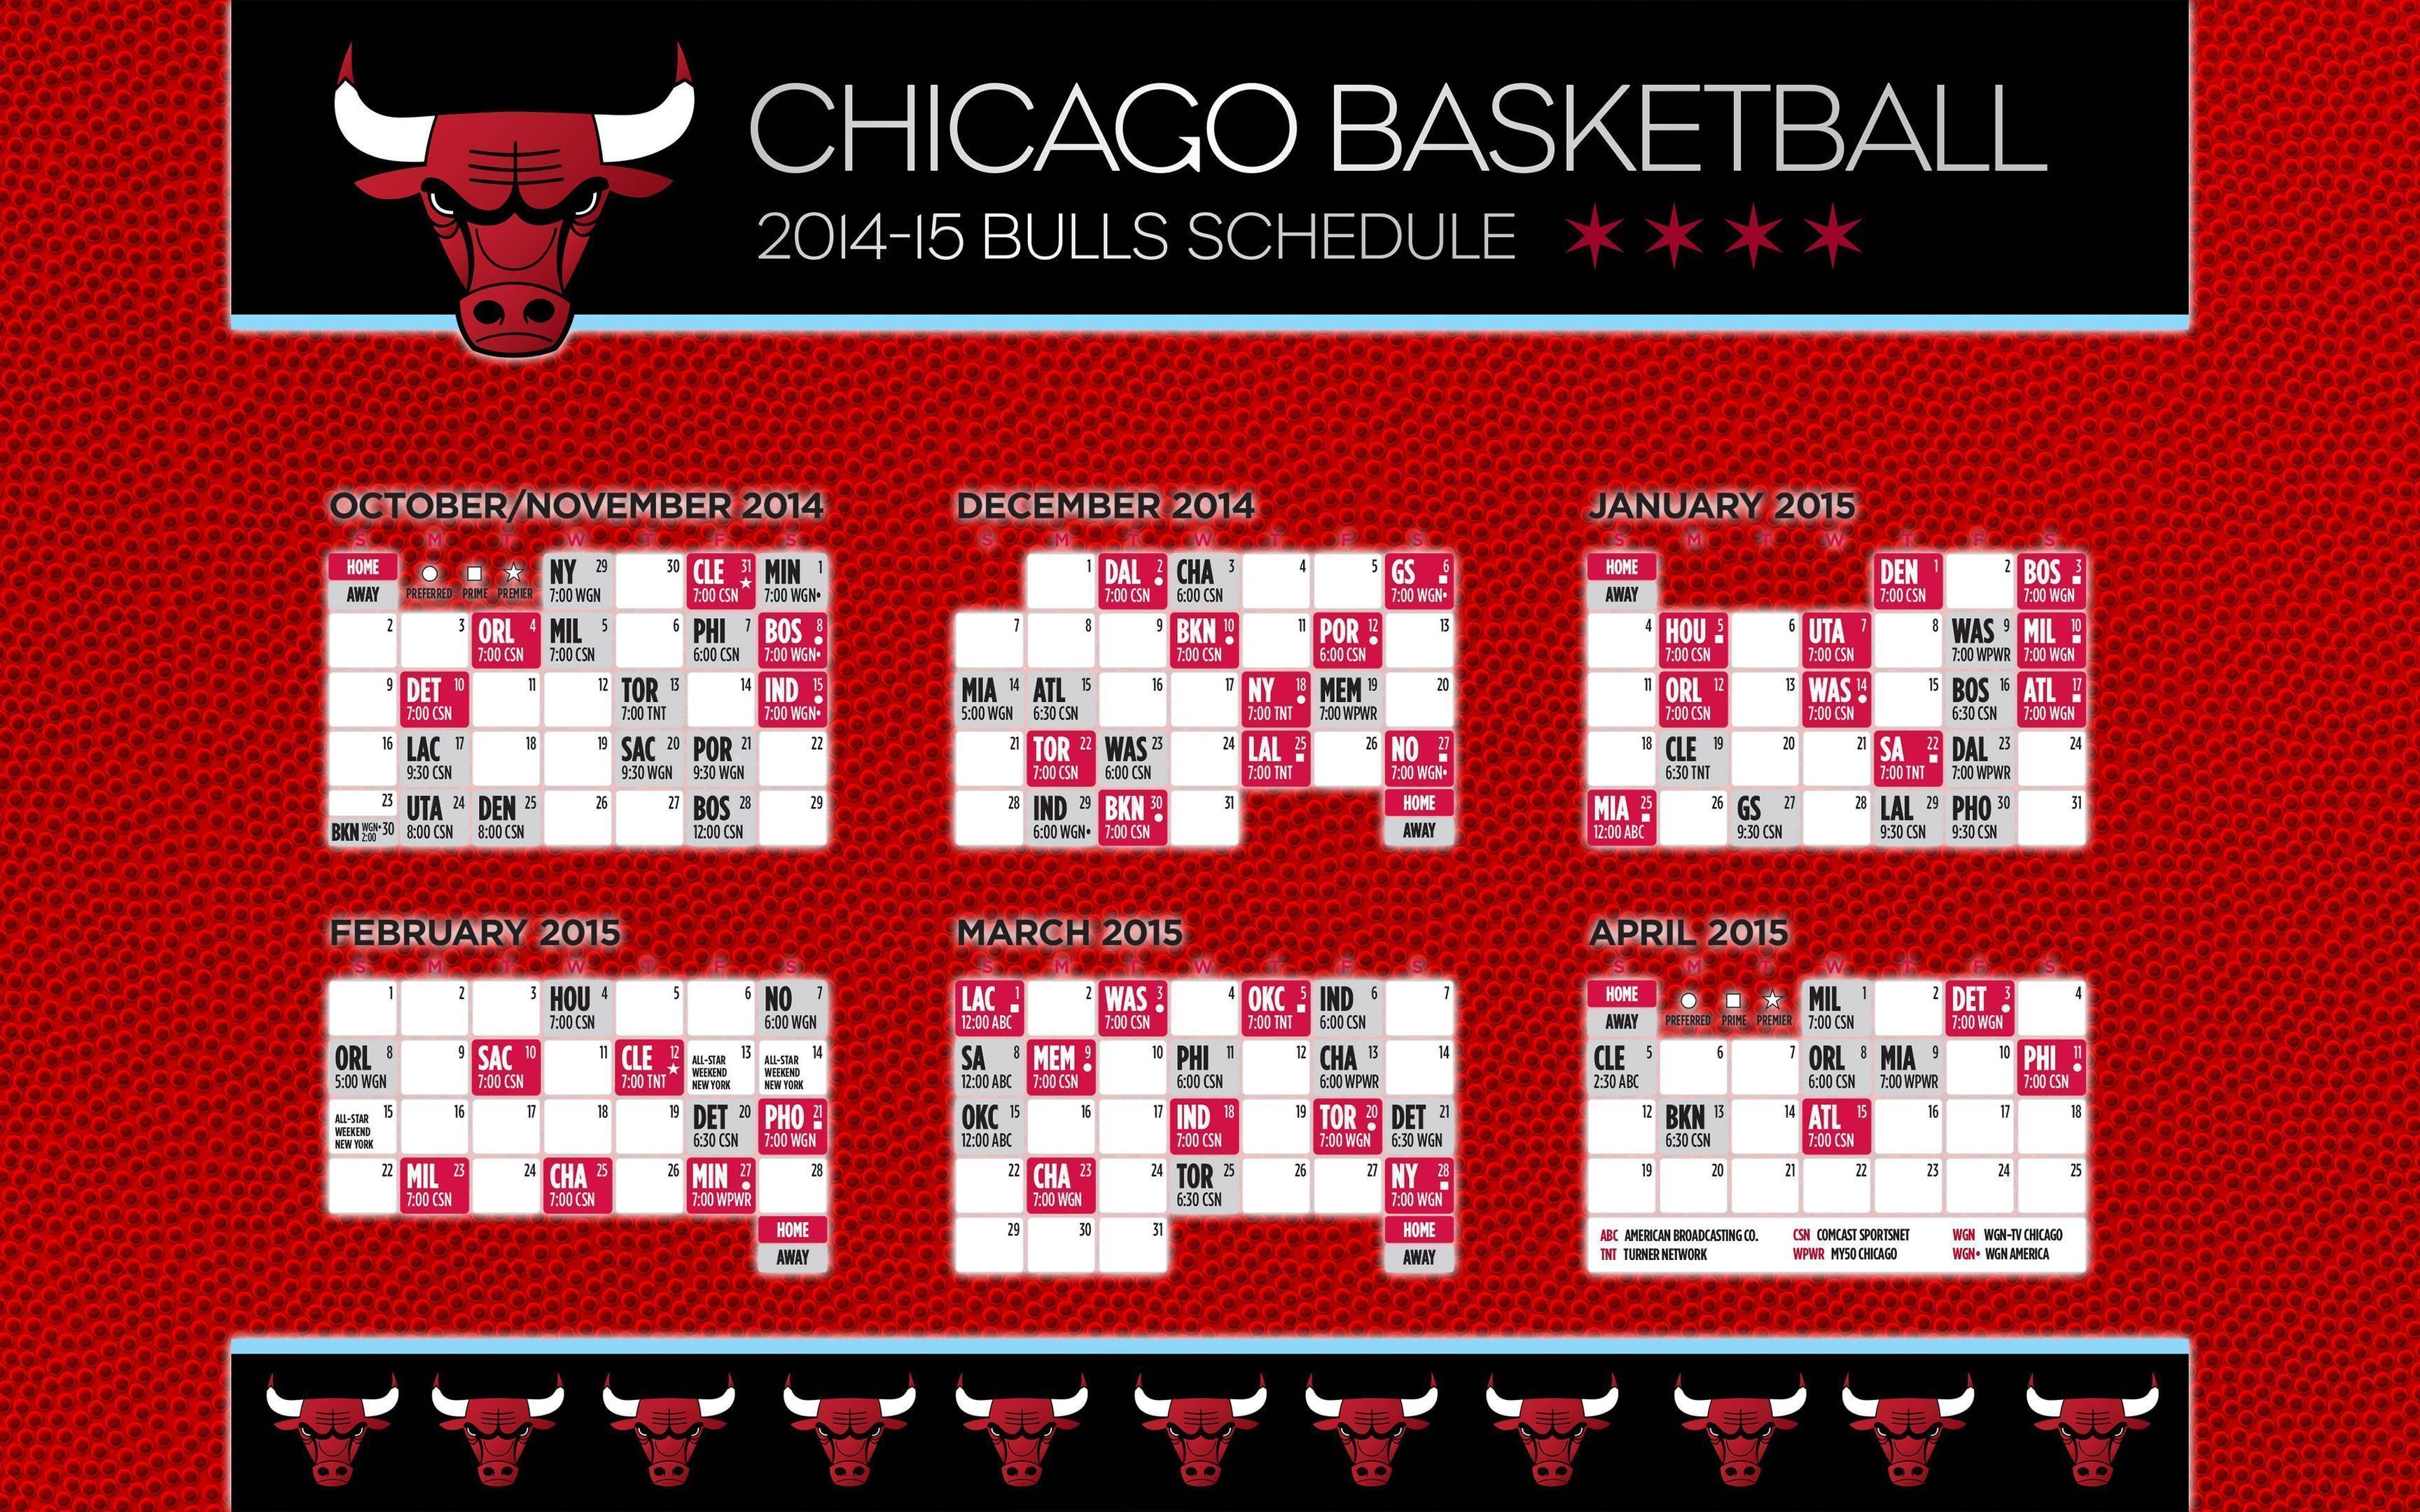 chicago bulls wallpapers 2015 - wallpaper cave